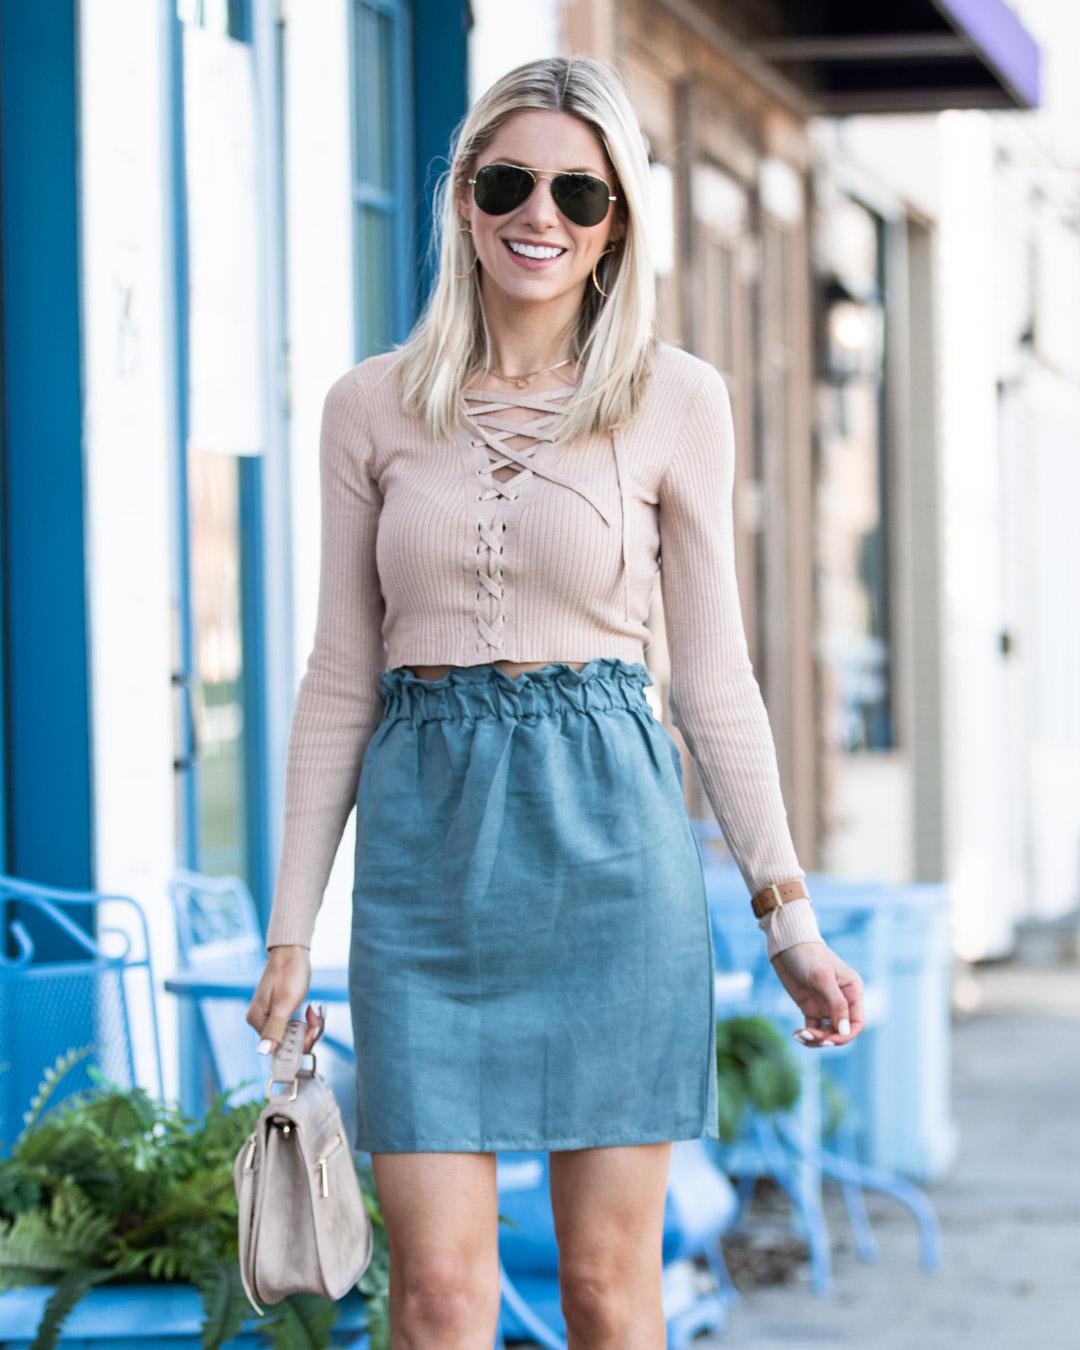 Simon Mall Spring Outfit Ideas